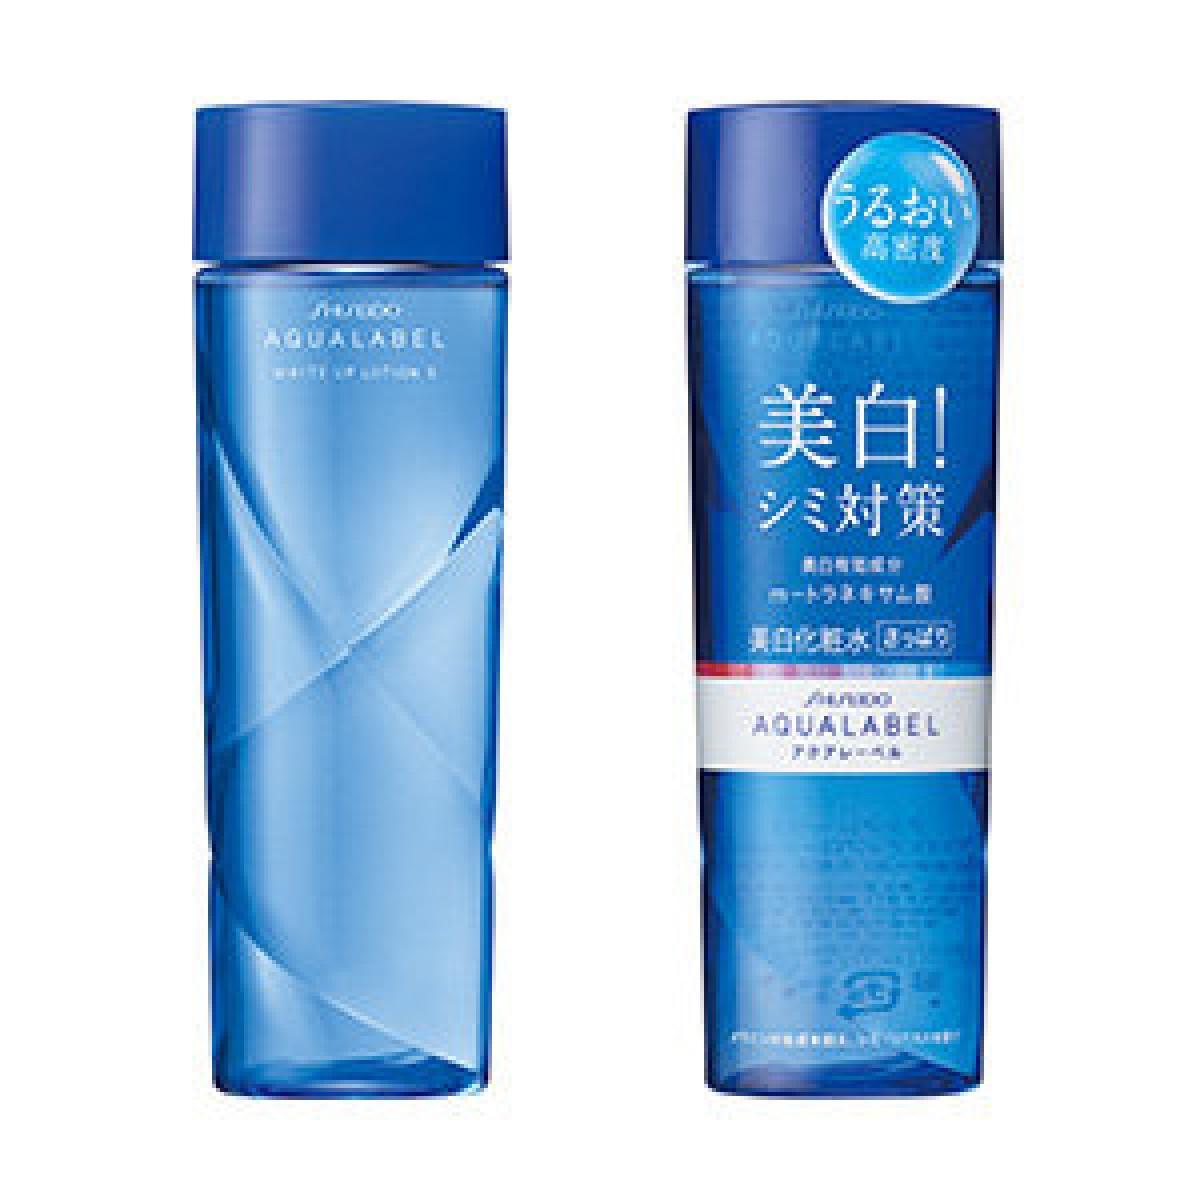 Nước hoa hồng Shiseido aqalable xanh